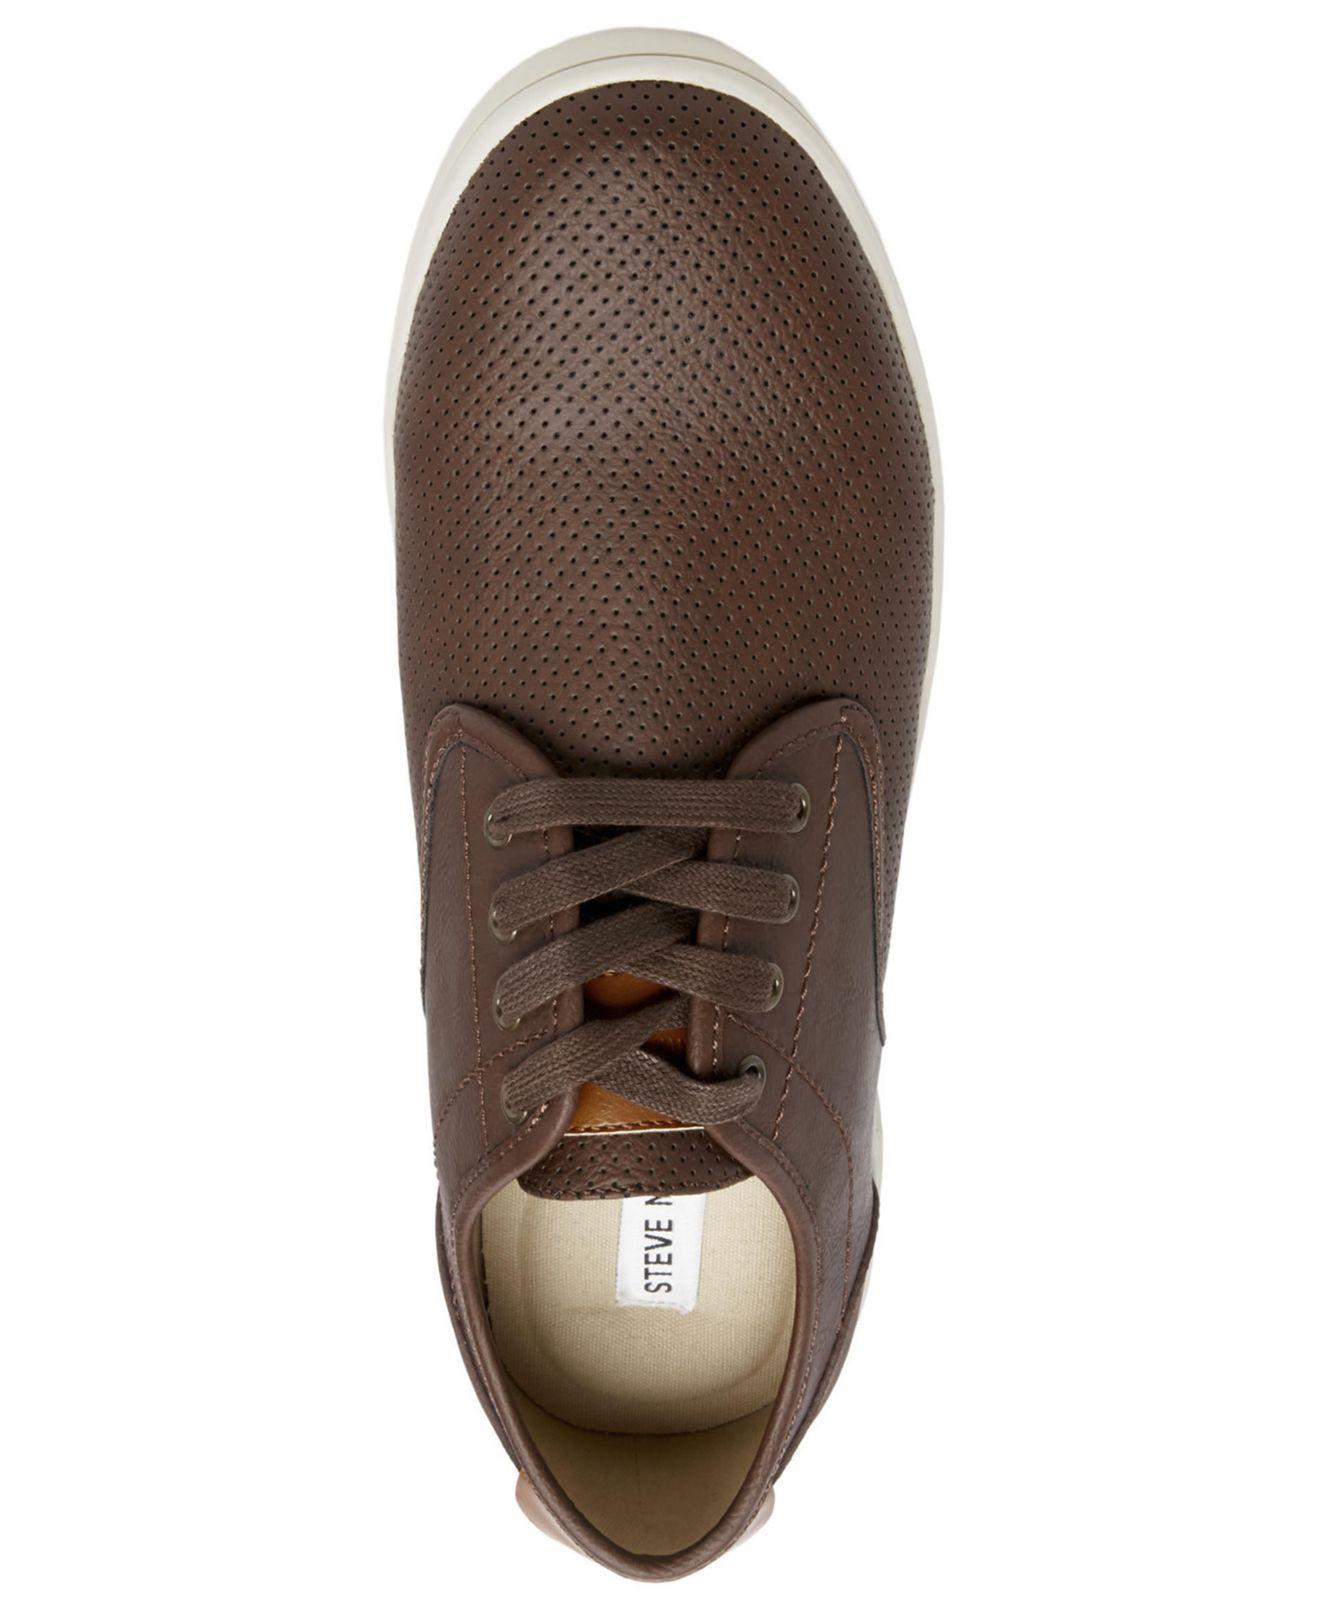 d4e0630977f Men's Brown Flyerz Sneakers